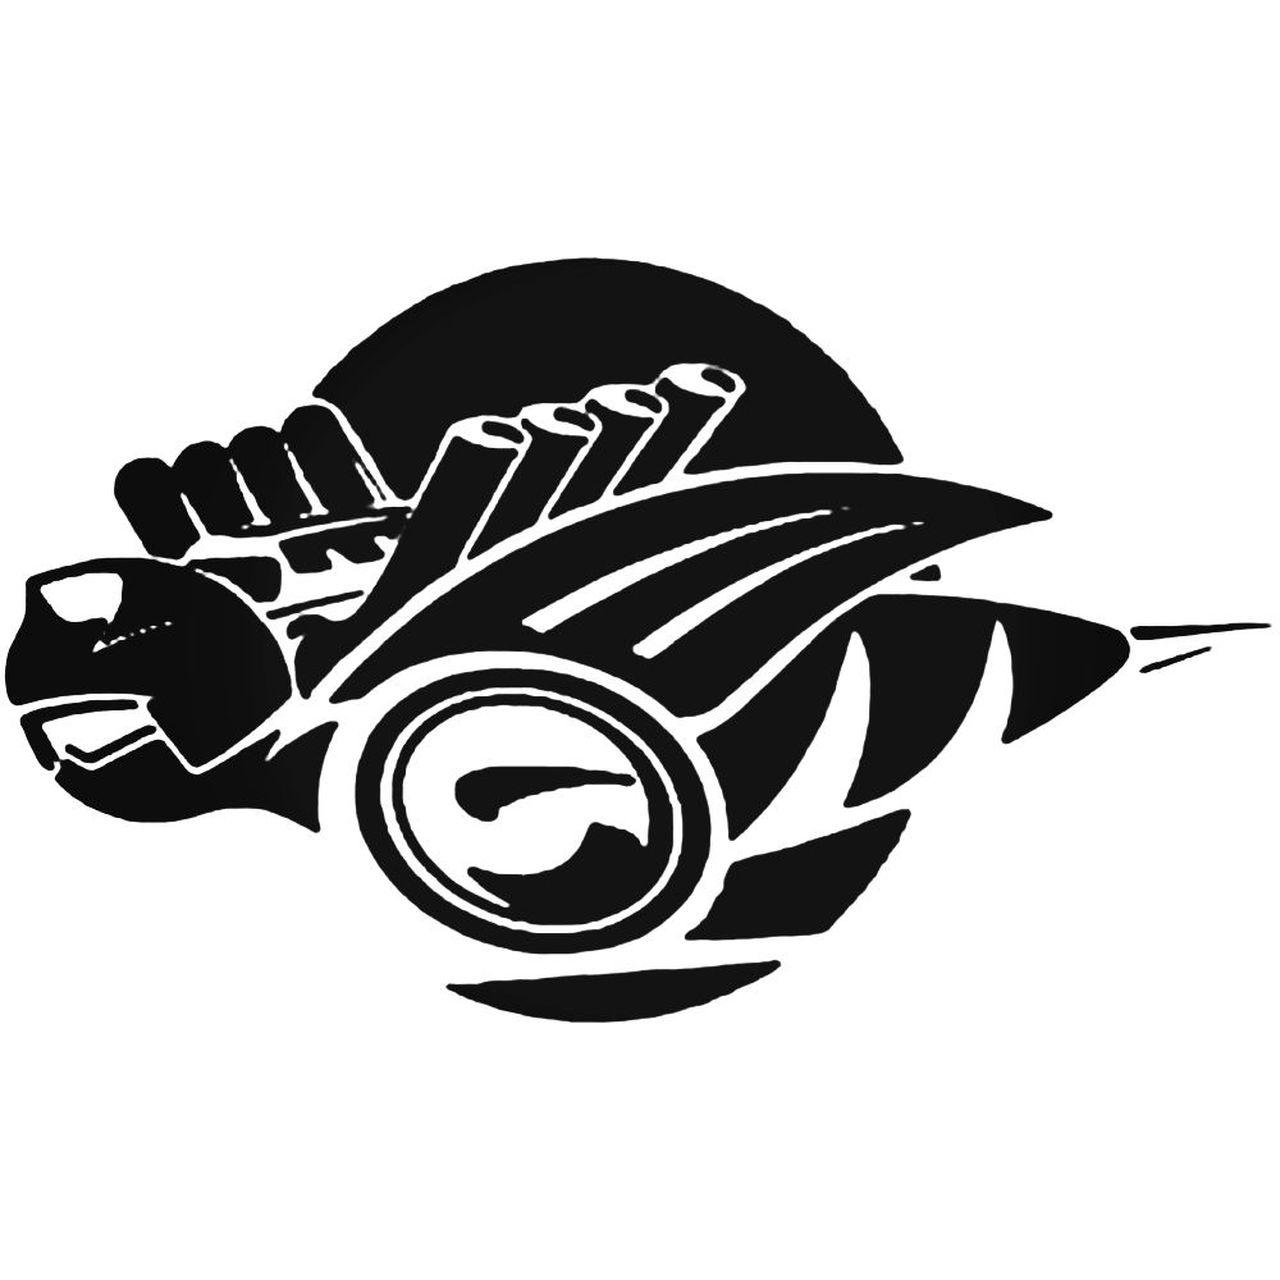 Dodge Rumble Bee Logo Vector Aftermarket Decal Sticker.